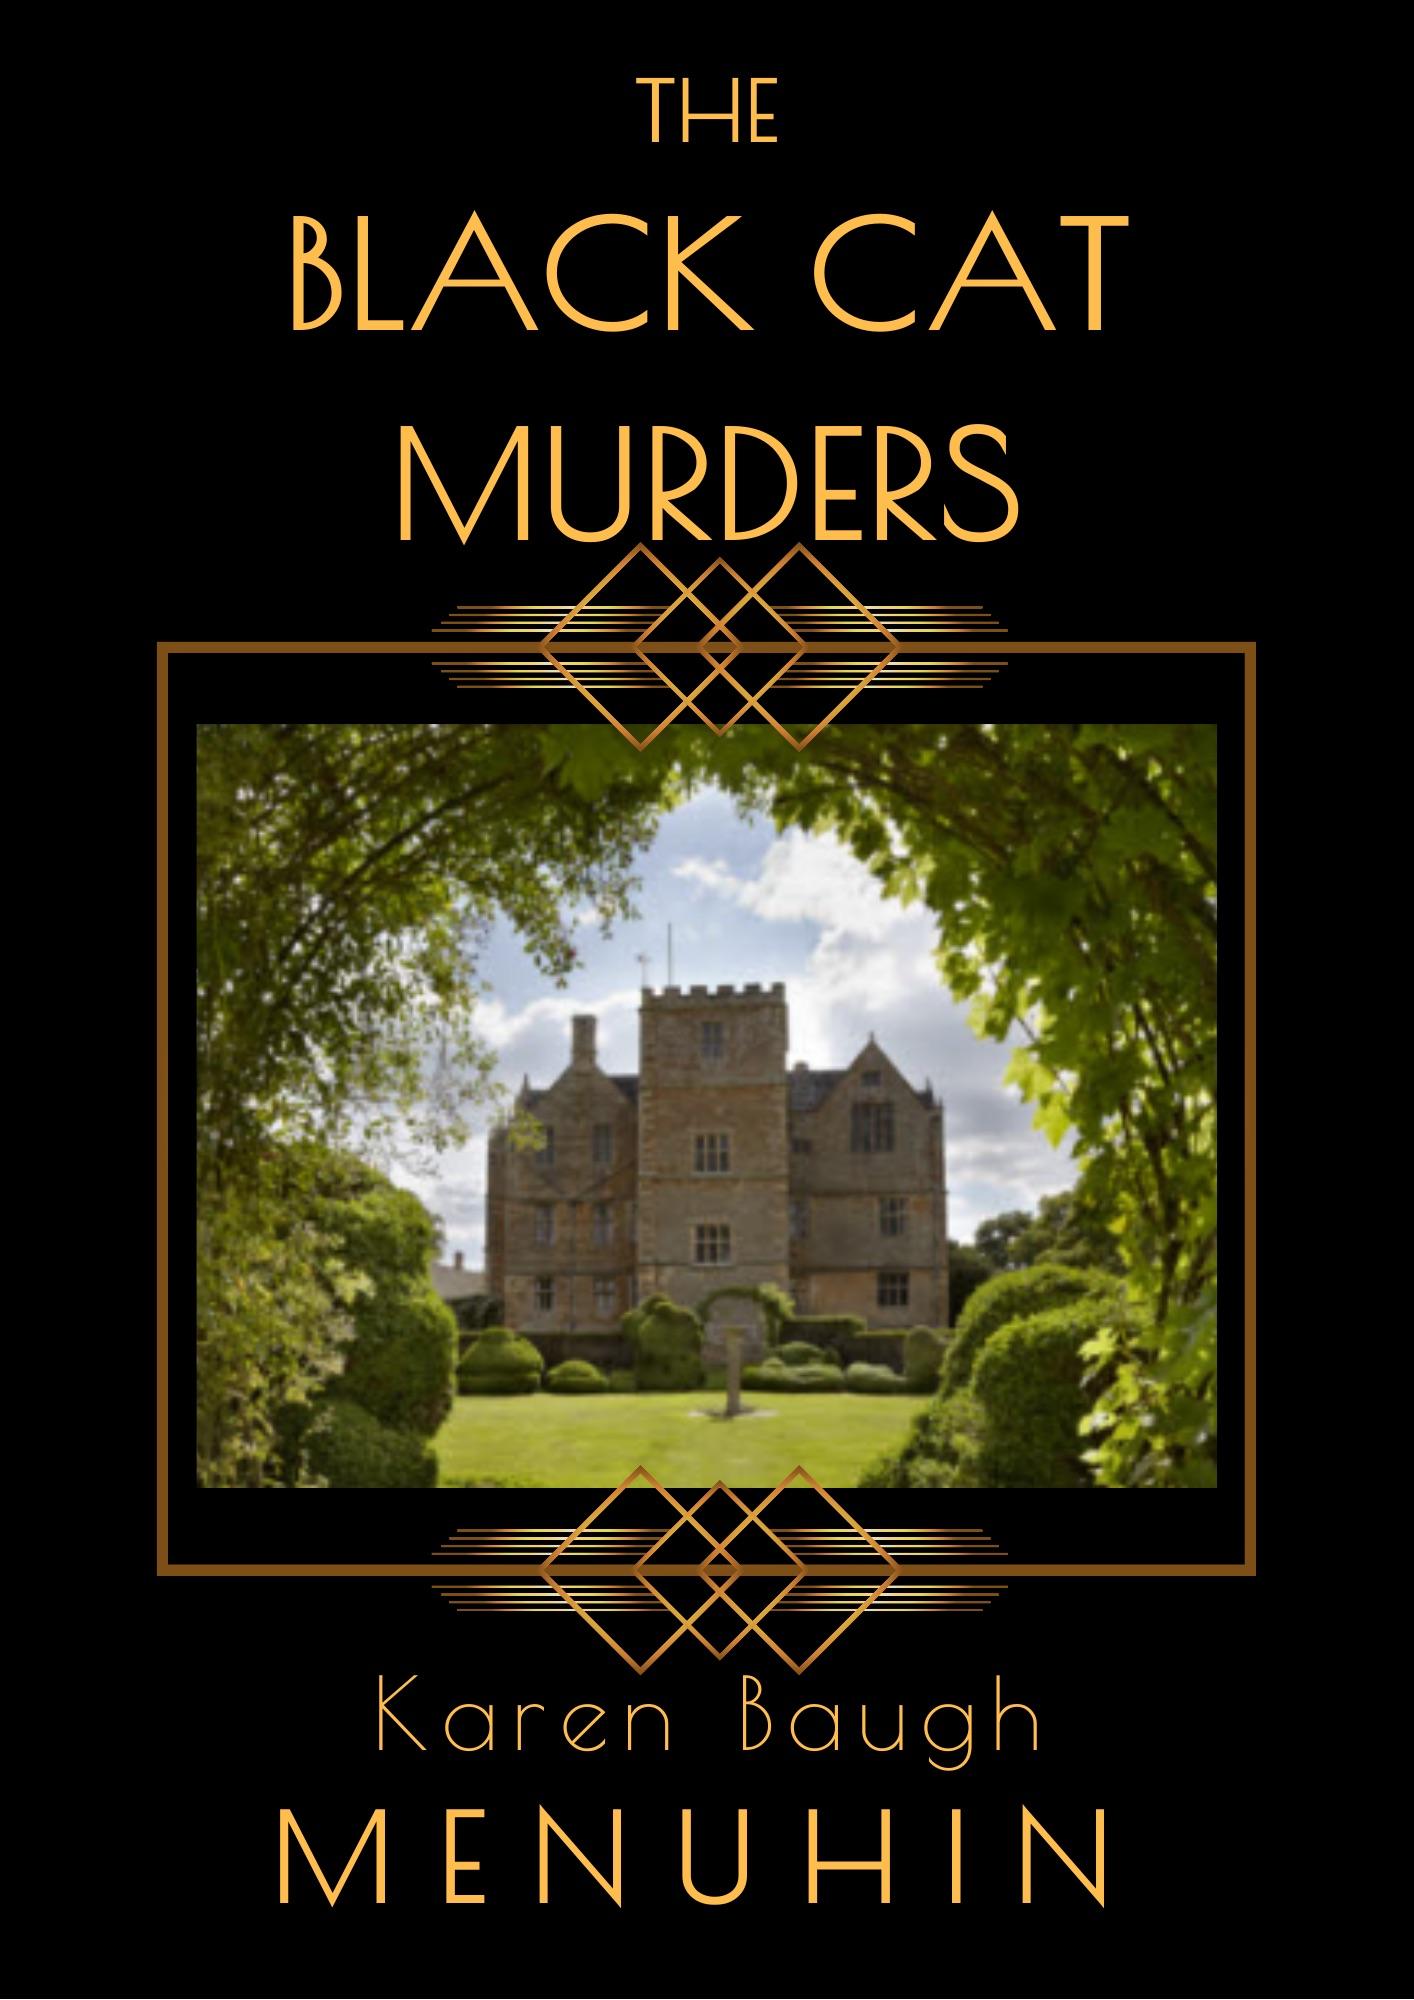 The Black Cat Murders (Heathcliff Lennox #2)